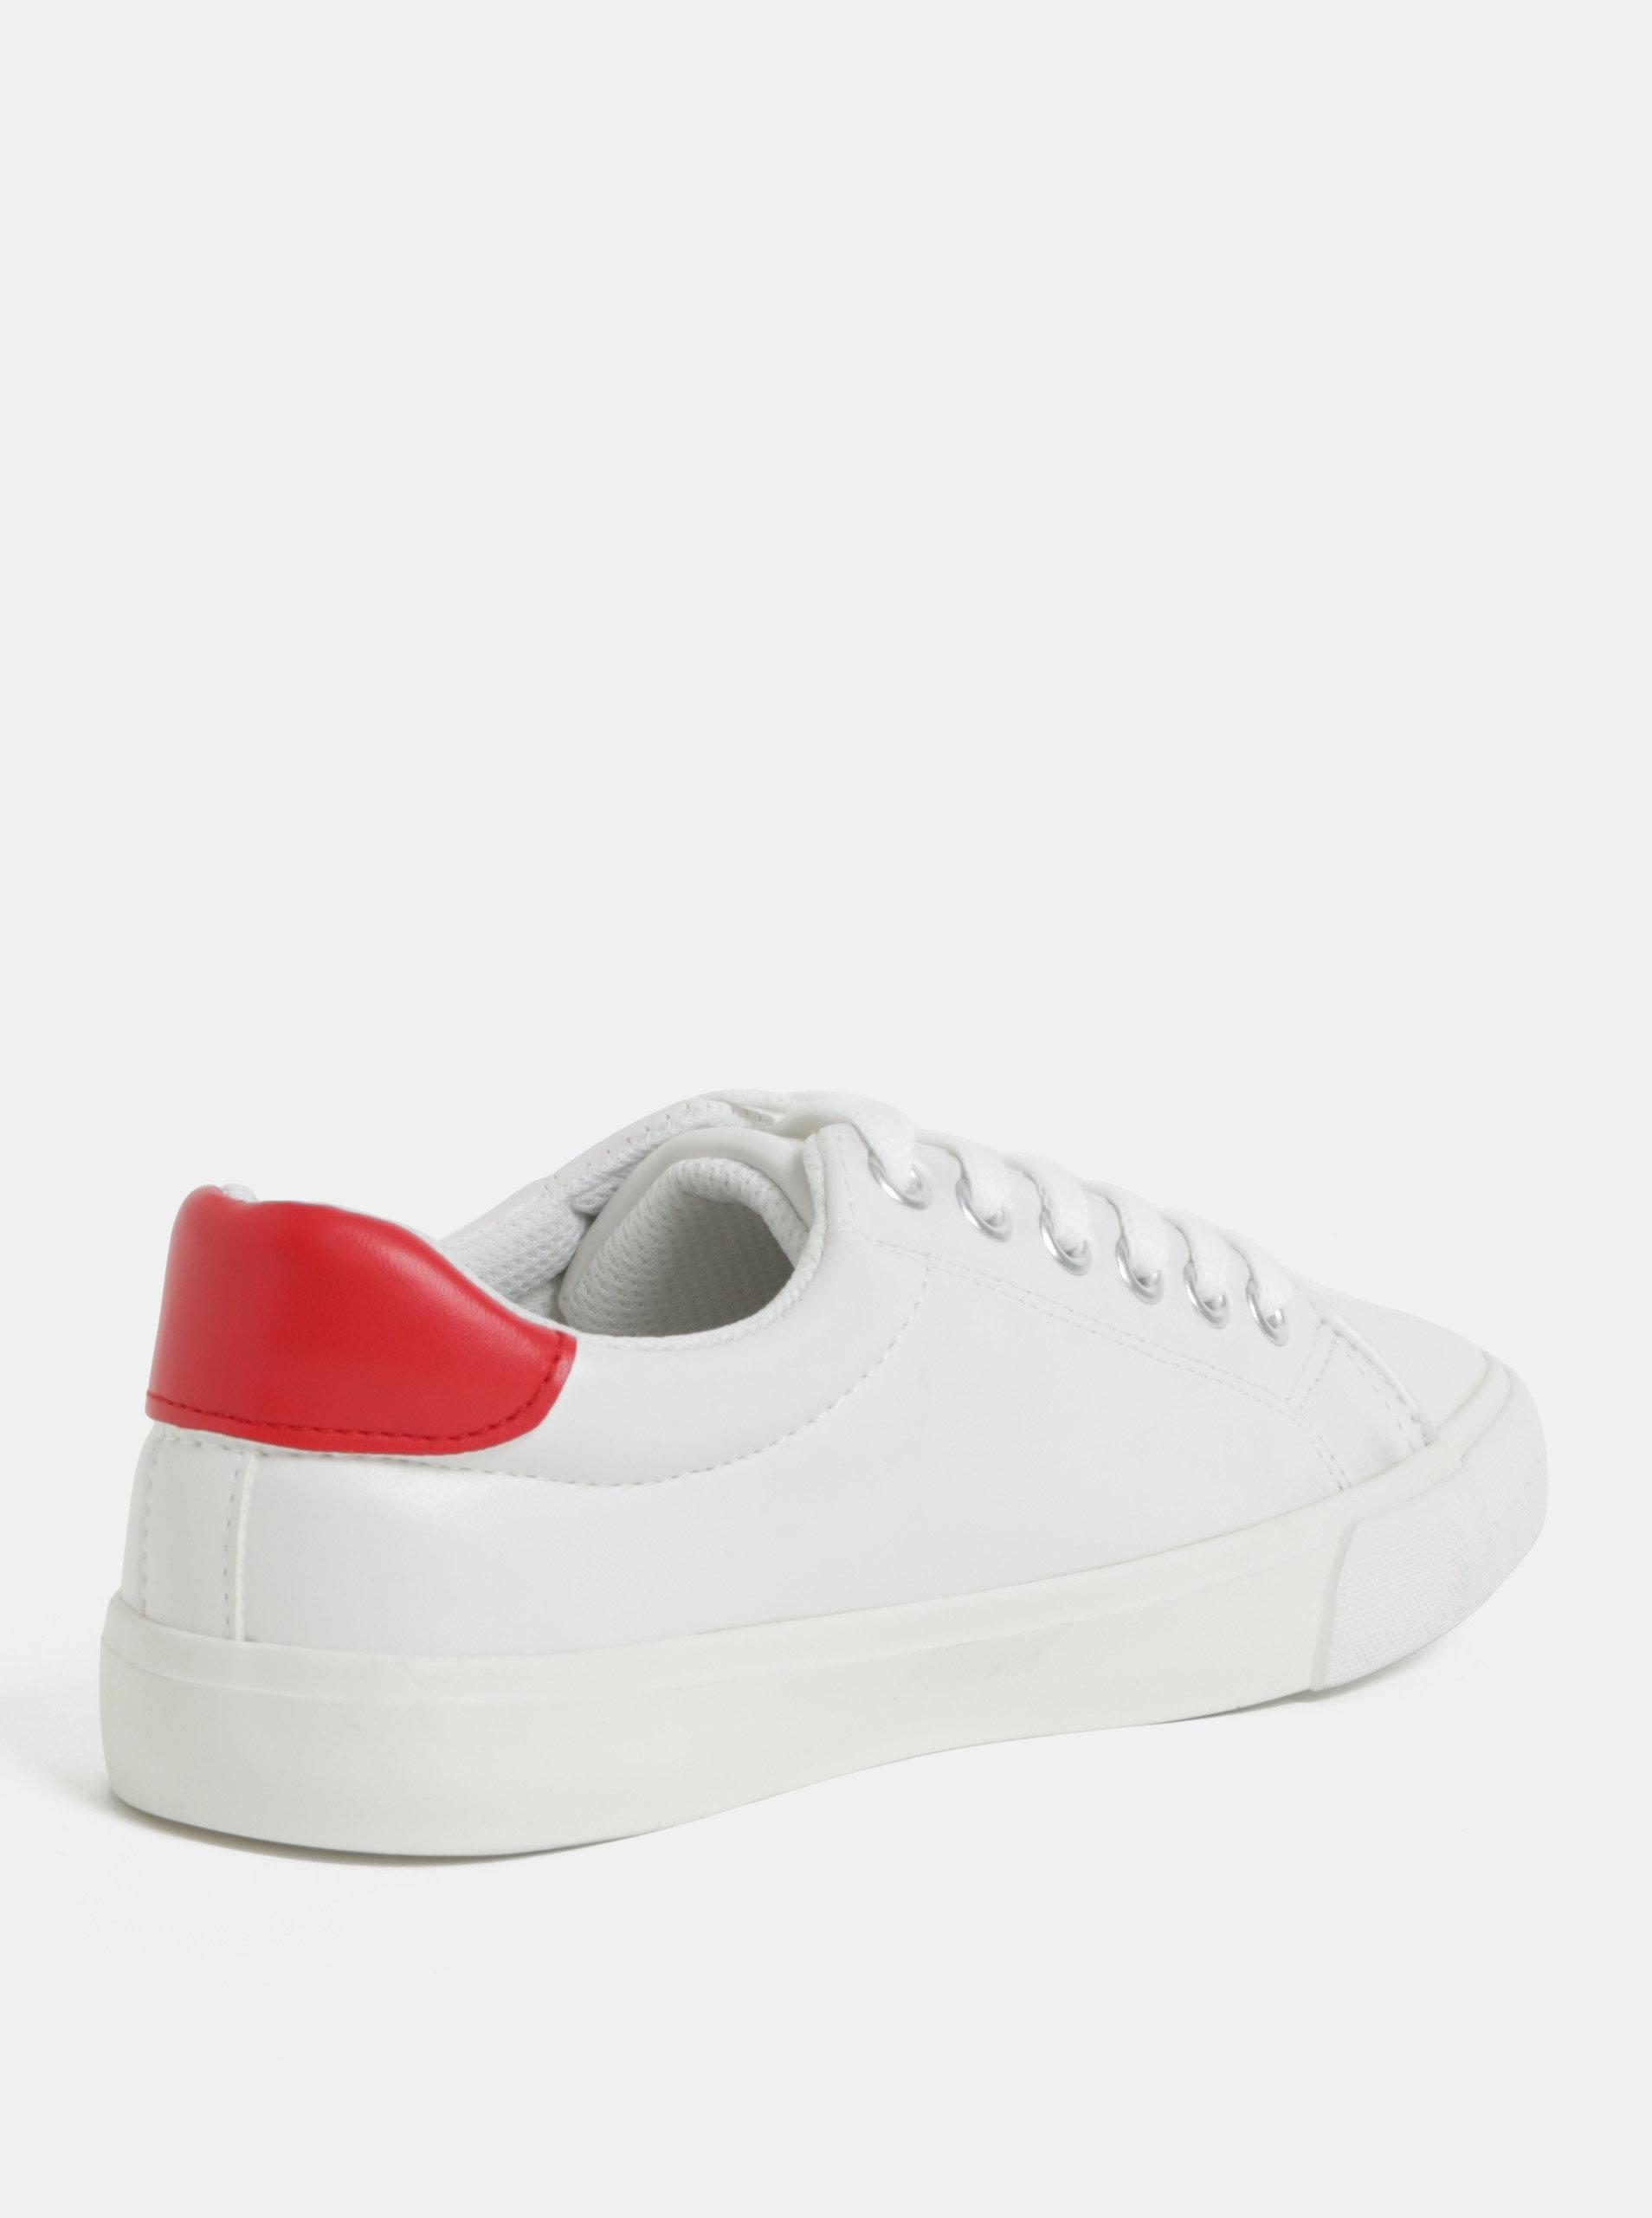 Červeno-bílé tenisky Dorothy Perkins ... c542dffffd